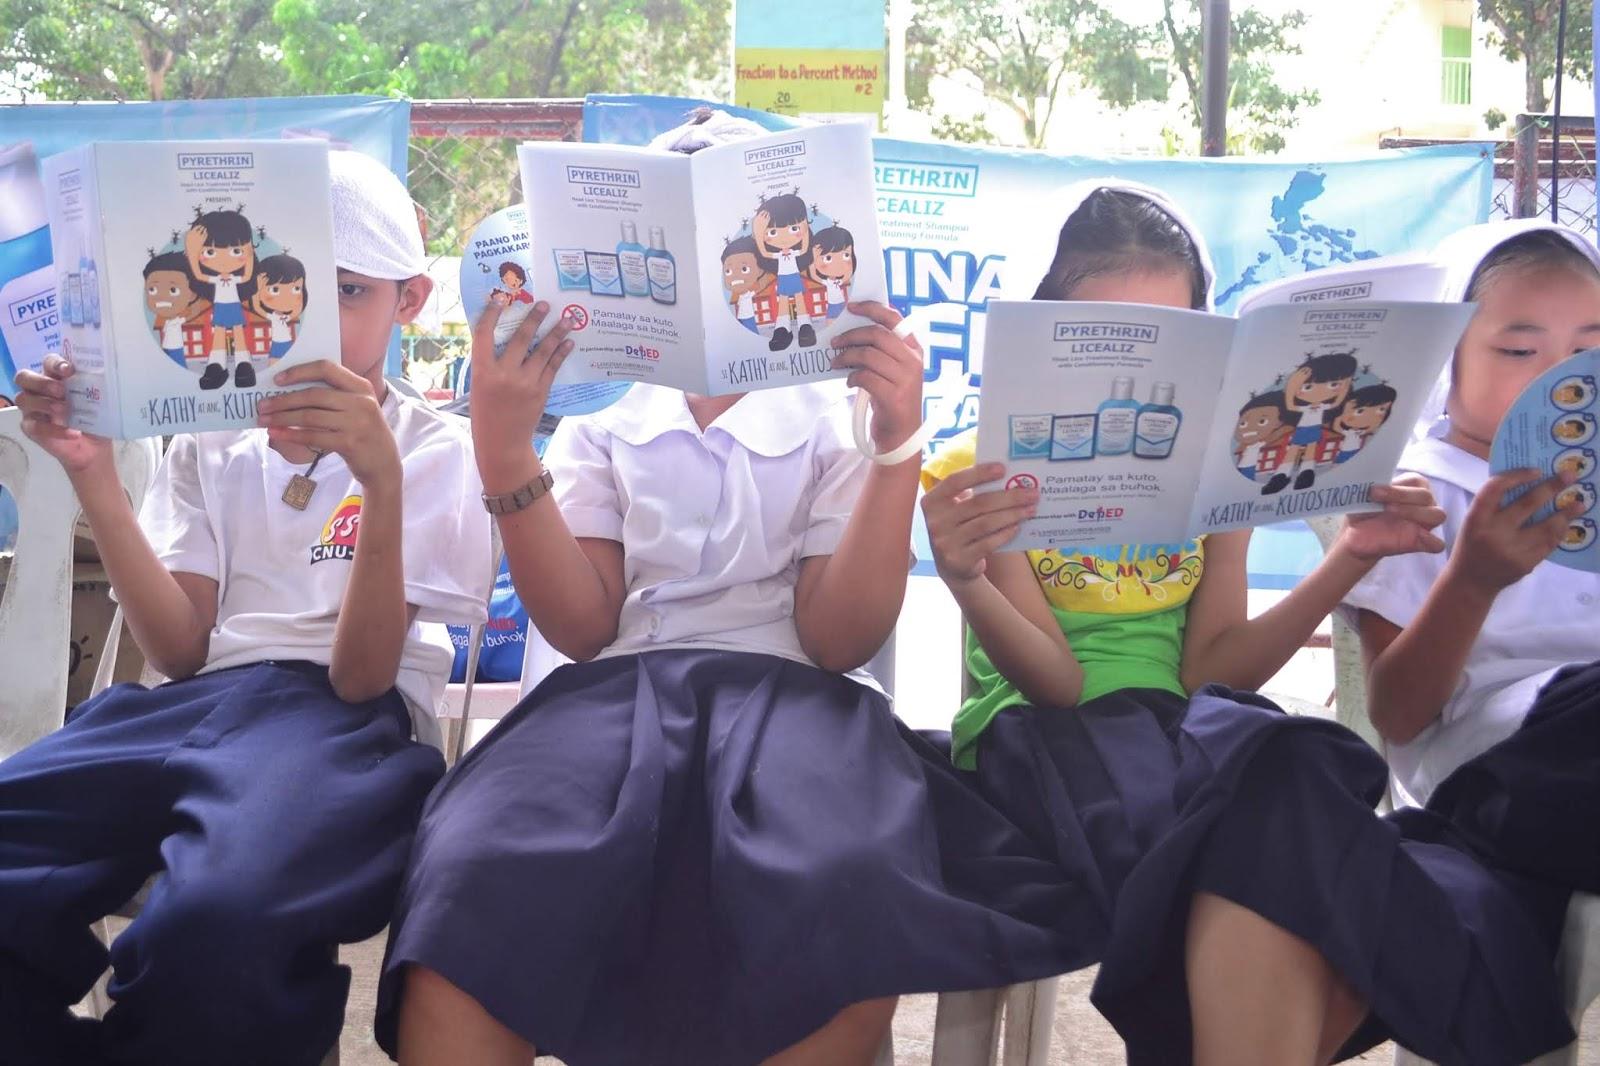 Licealiz Cebu Students